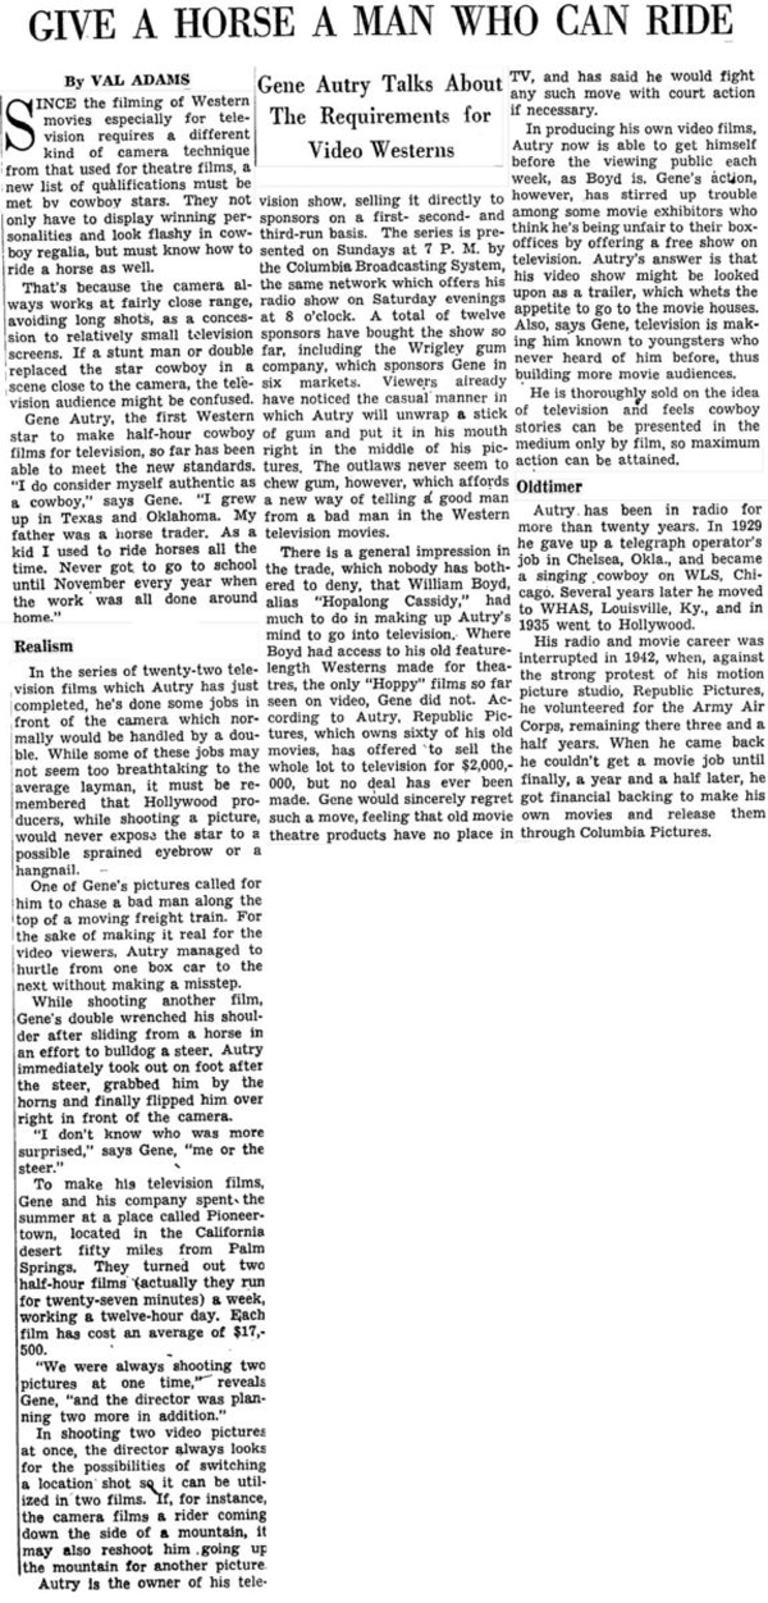 Oct. 8, 1950 - New York Times